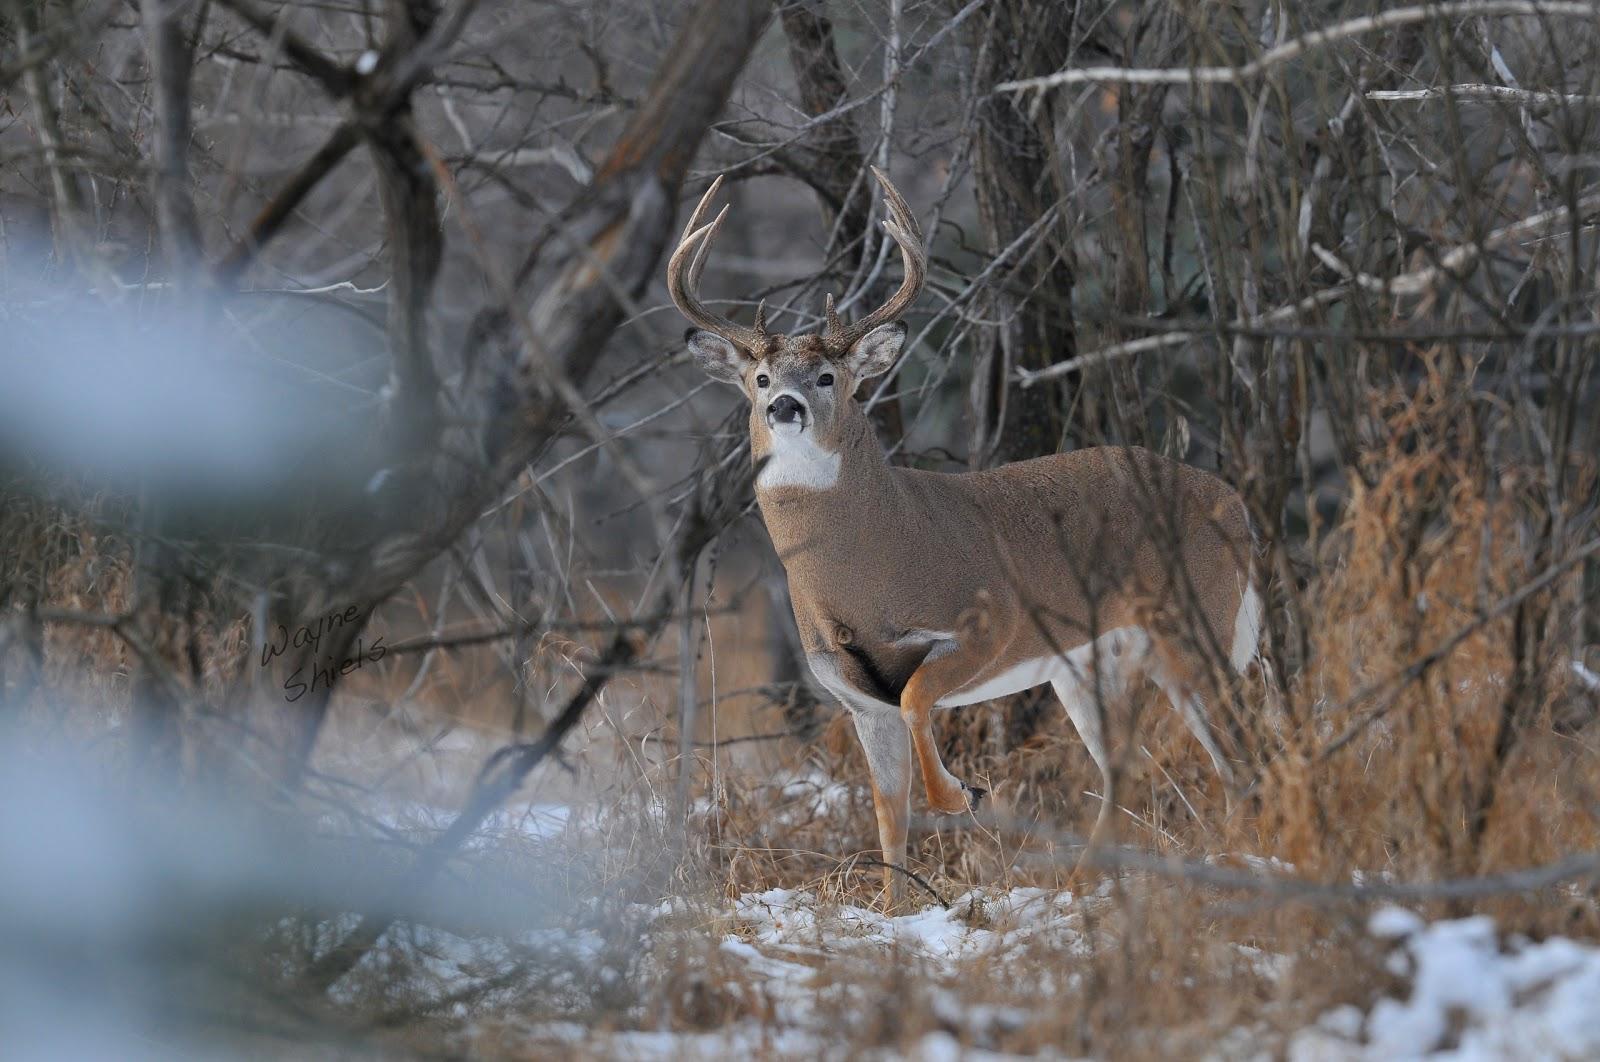 [50+] Big Whitetail Buck Wallpaper on WallpaperSafari |Wide Deer Wildlife